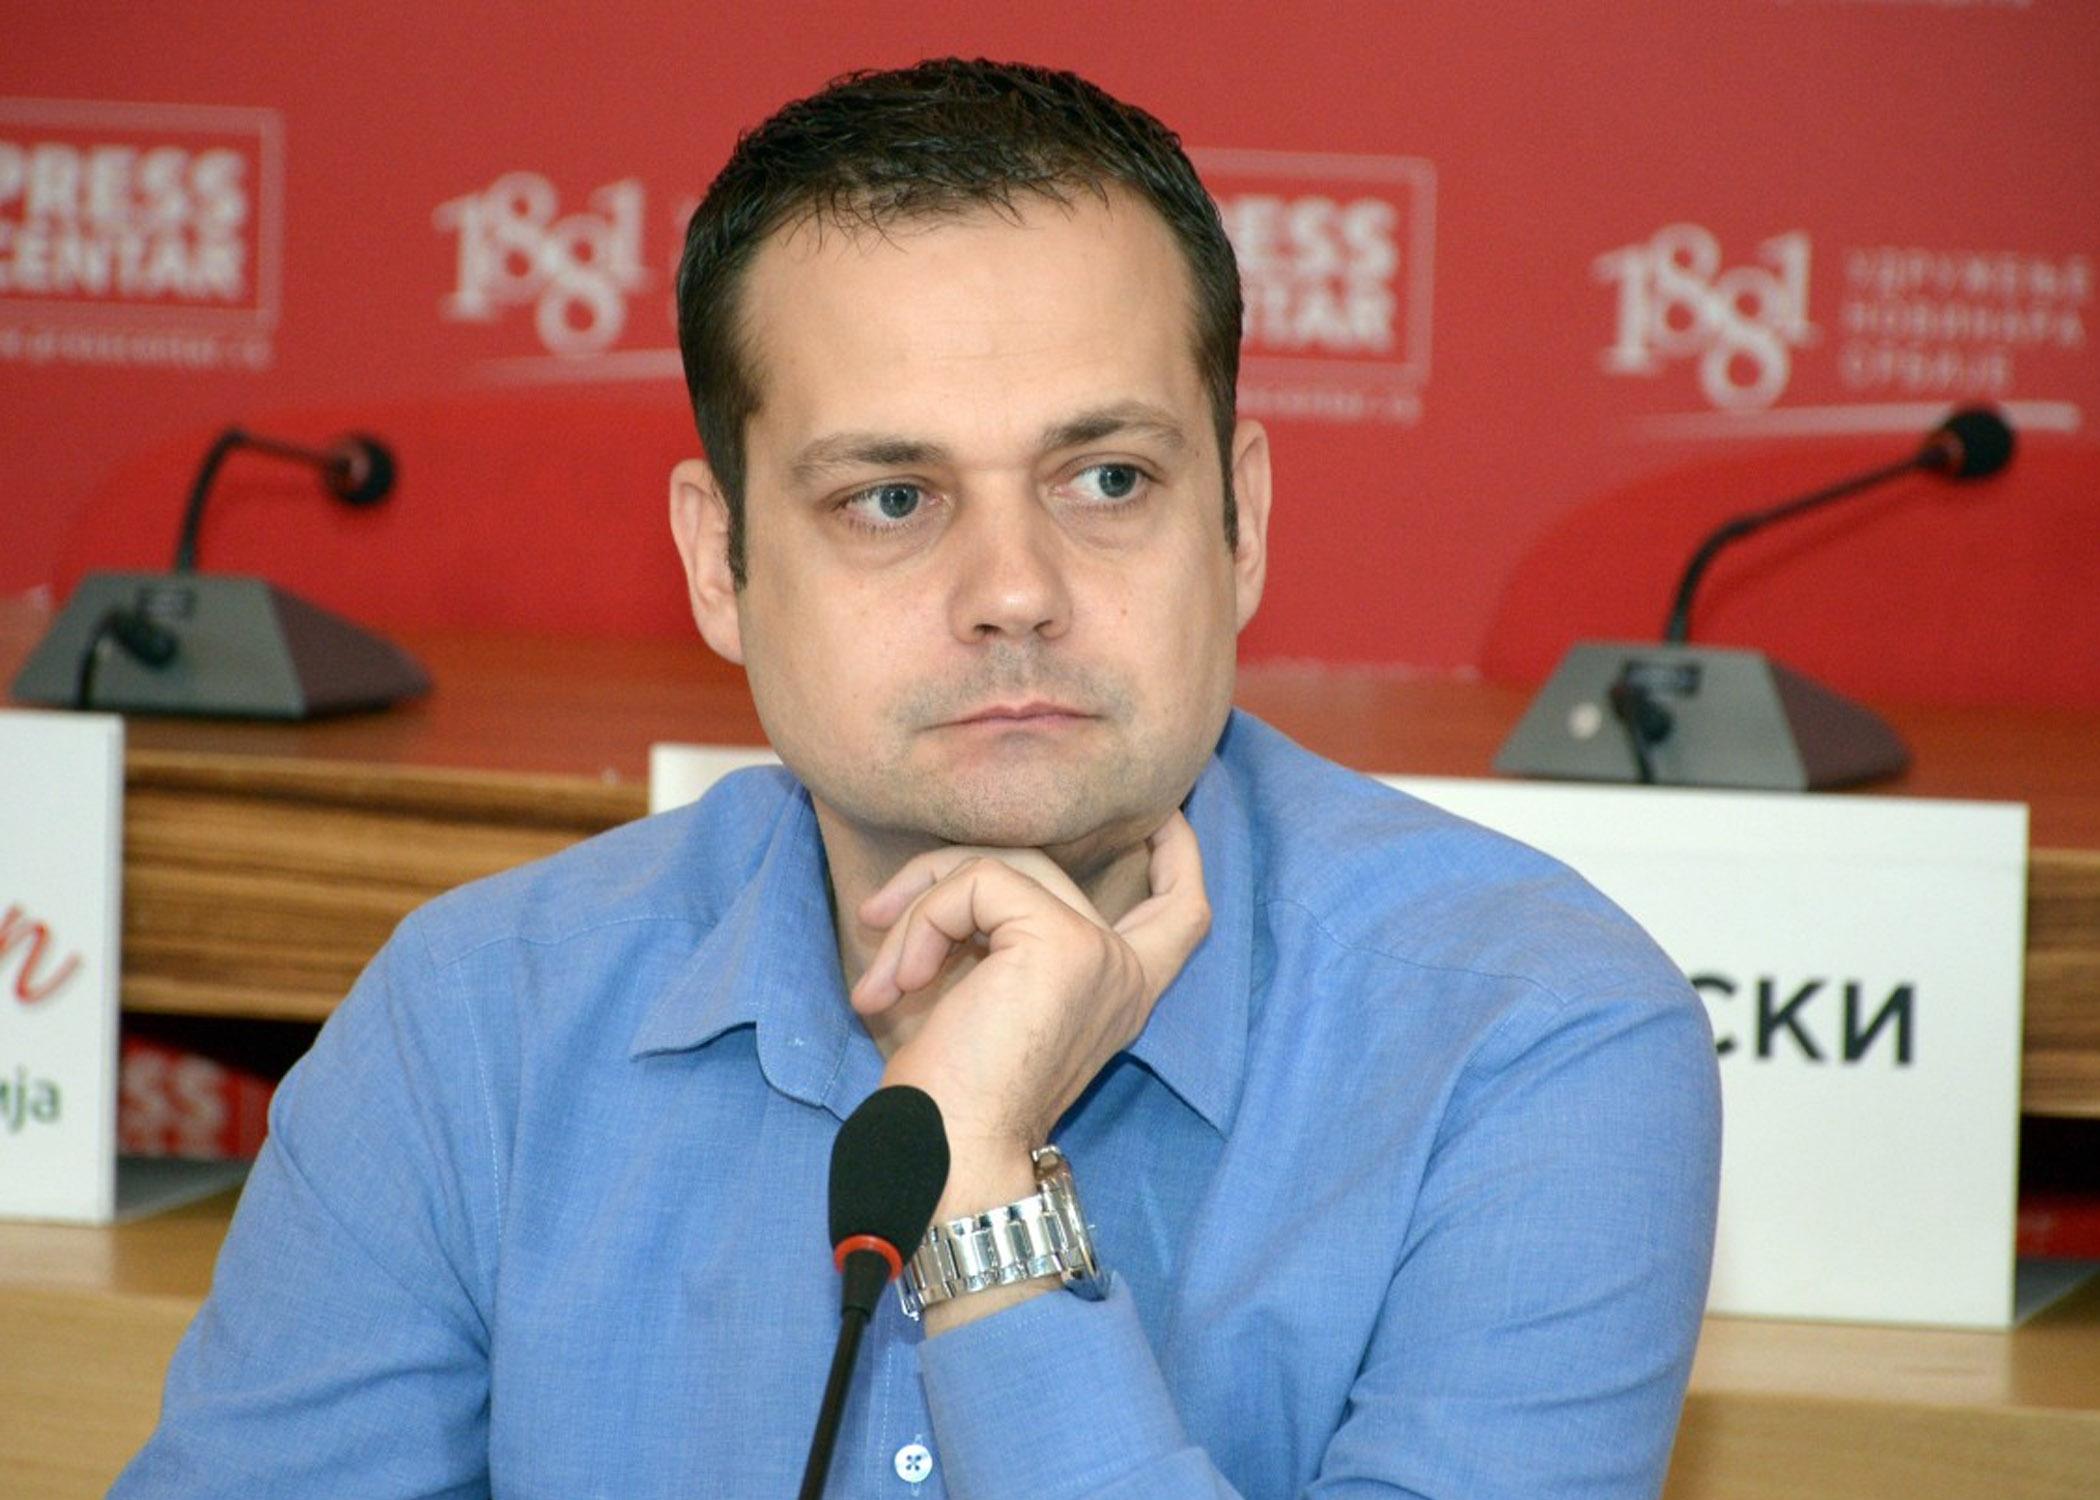 Aleksandar Markov